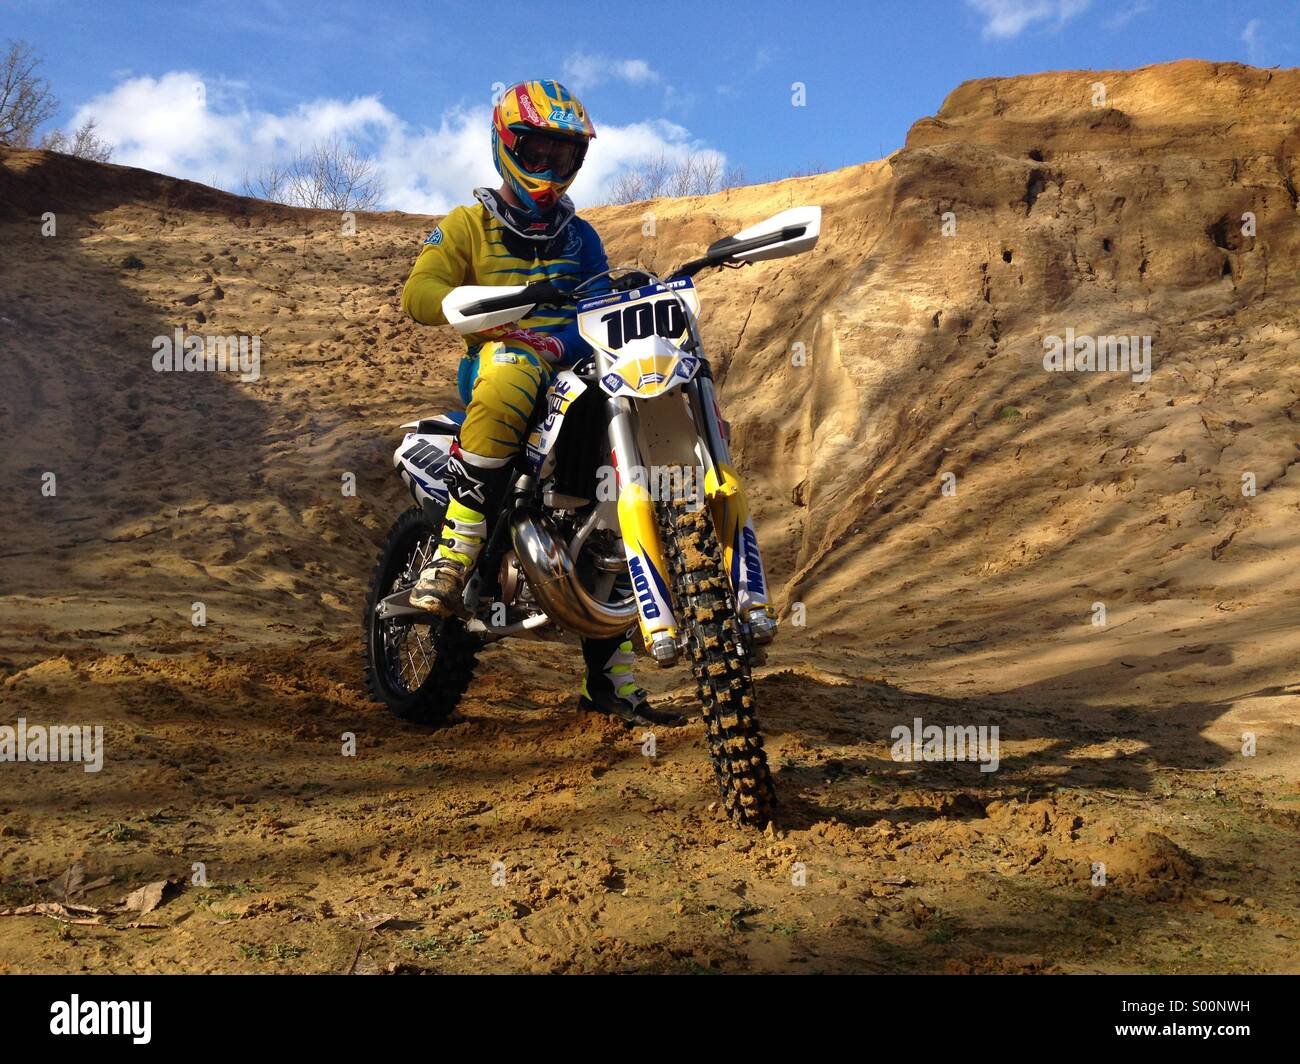 Extreme sport motocross rider on husky husqvarna bike is sand quarry Stock Photo